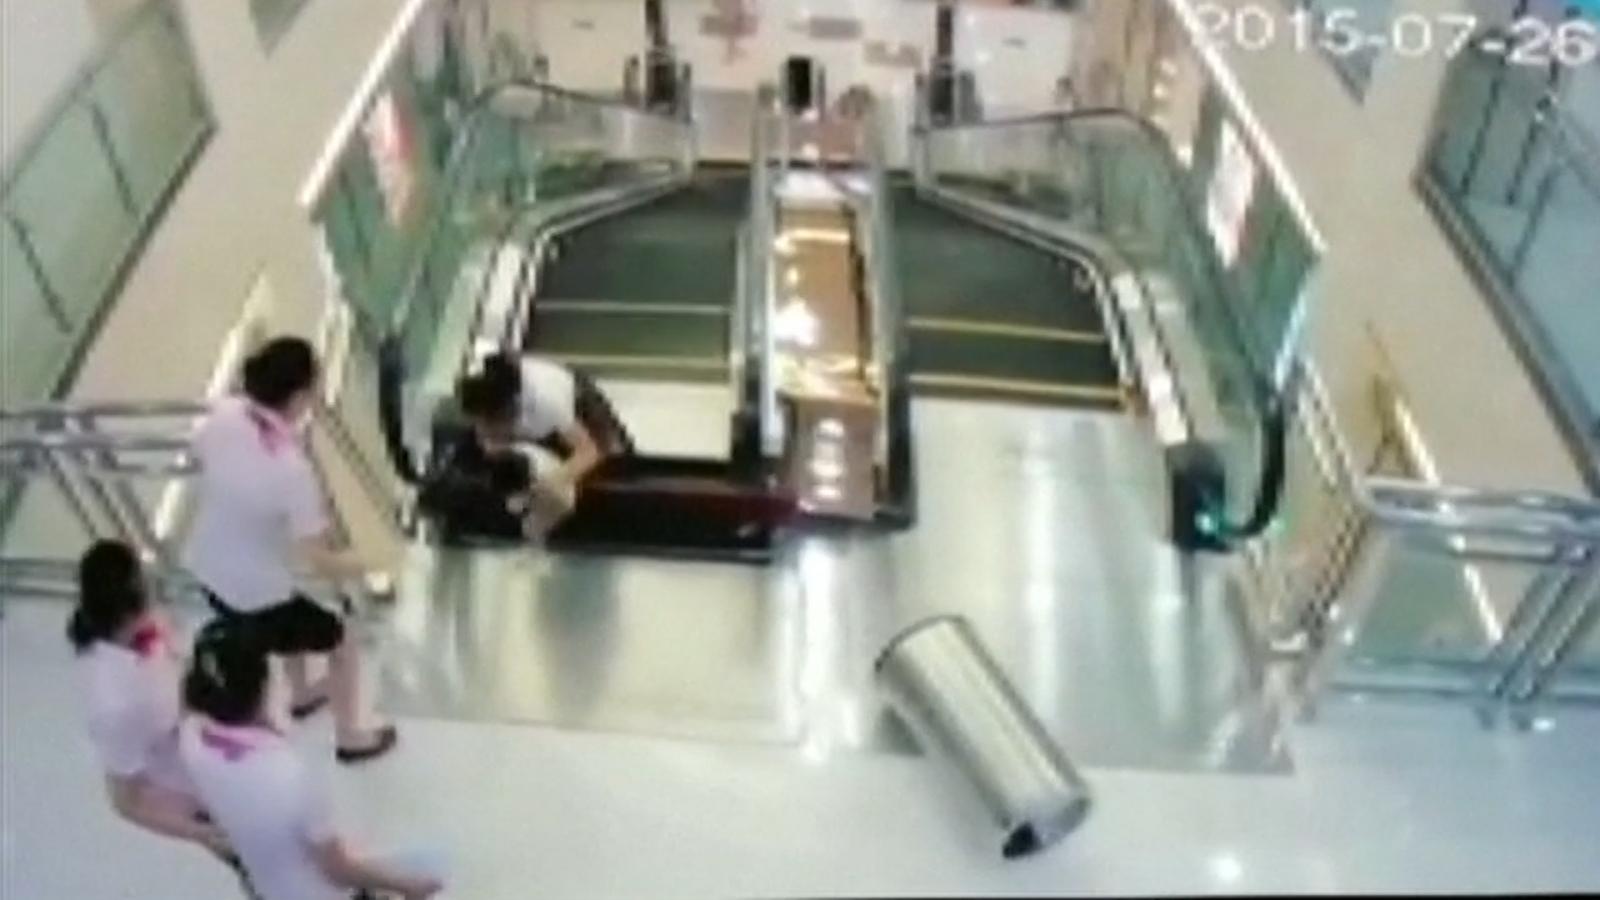 Chinese woman escalator incident